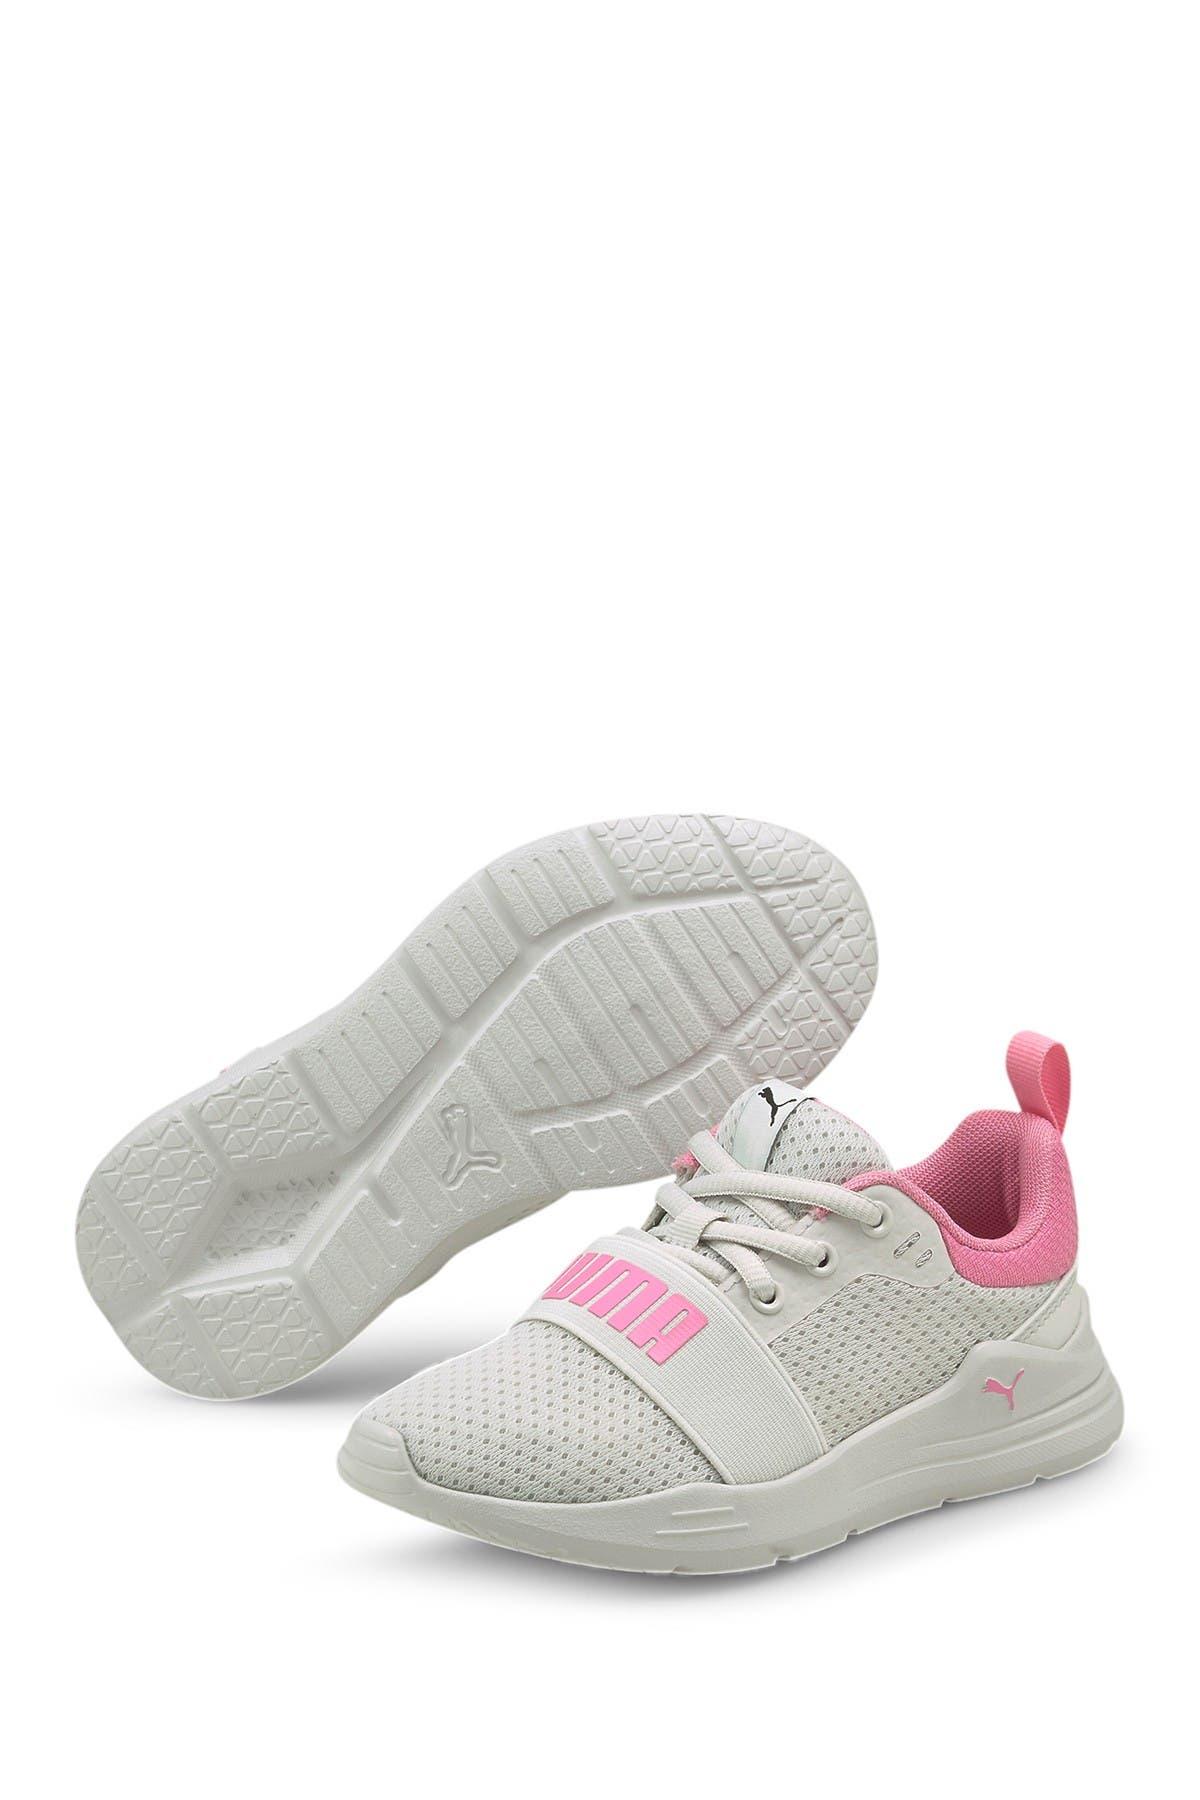 Image of PUMA Wired Run Sneaker